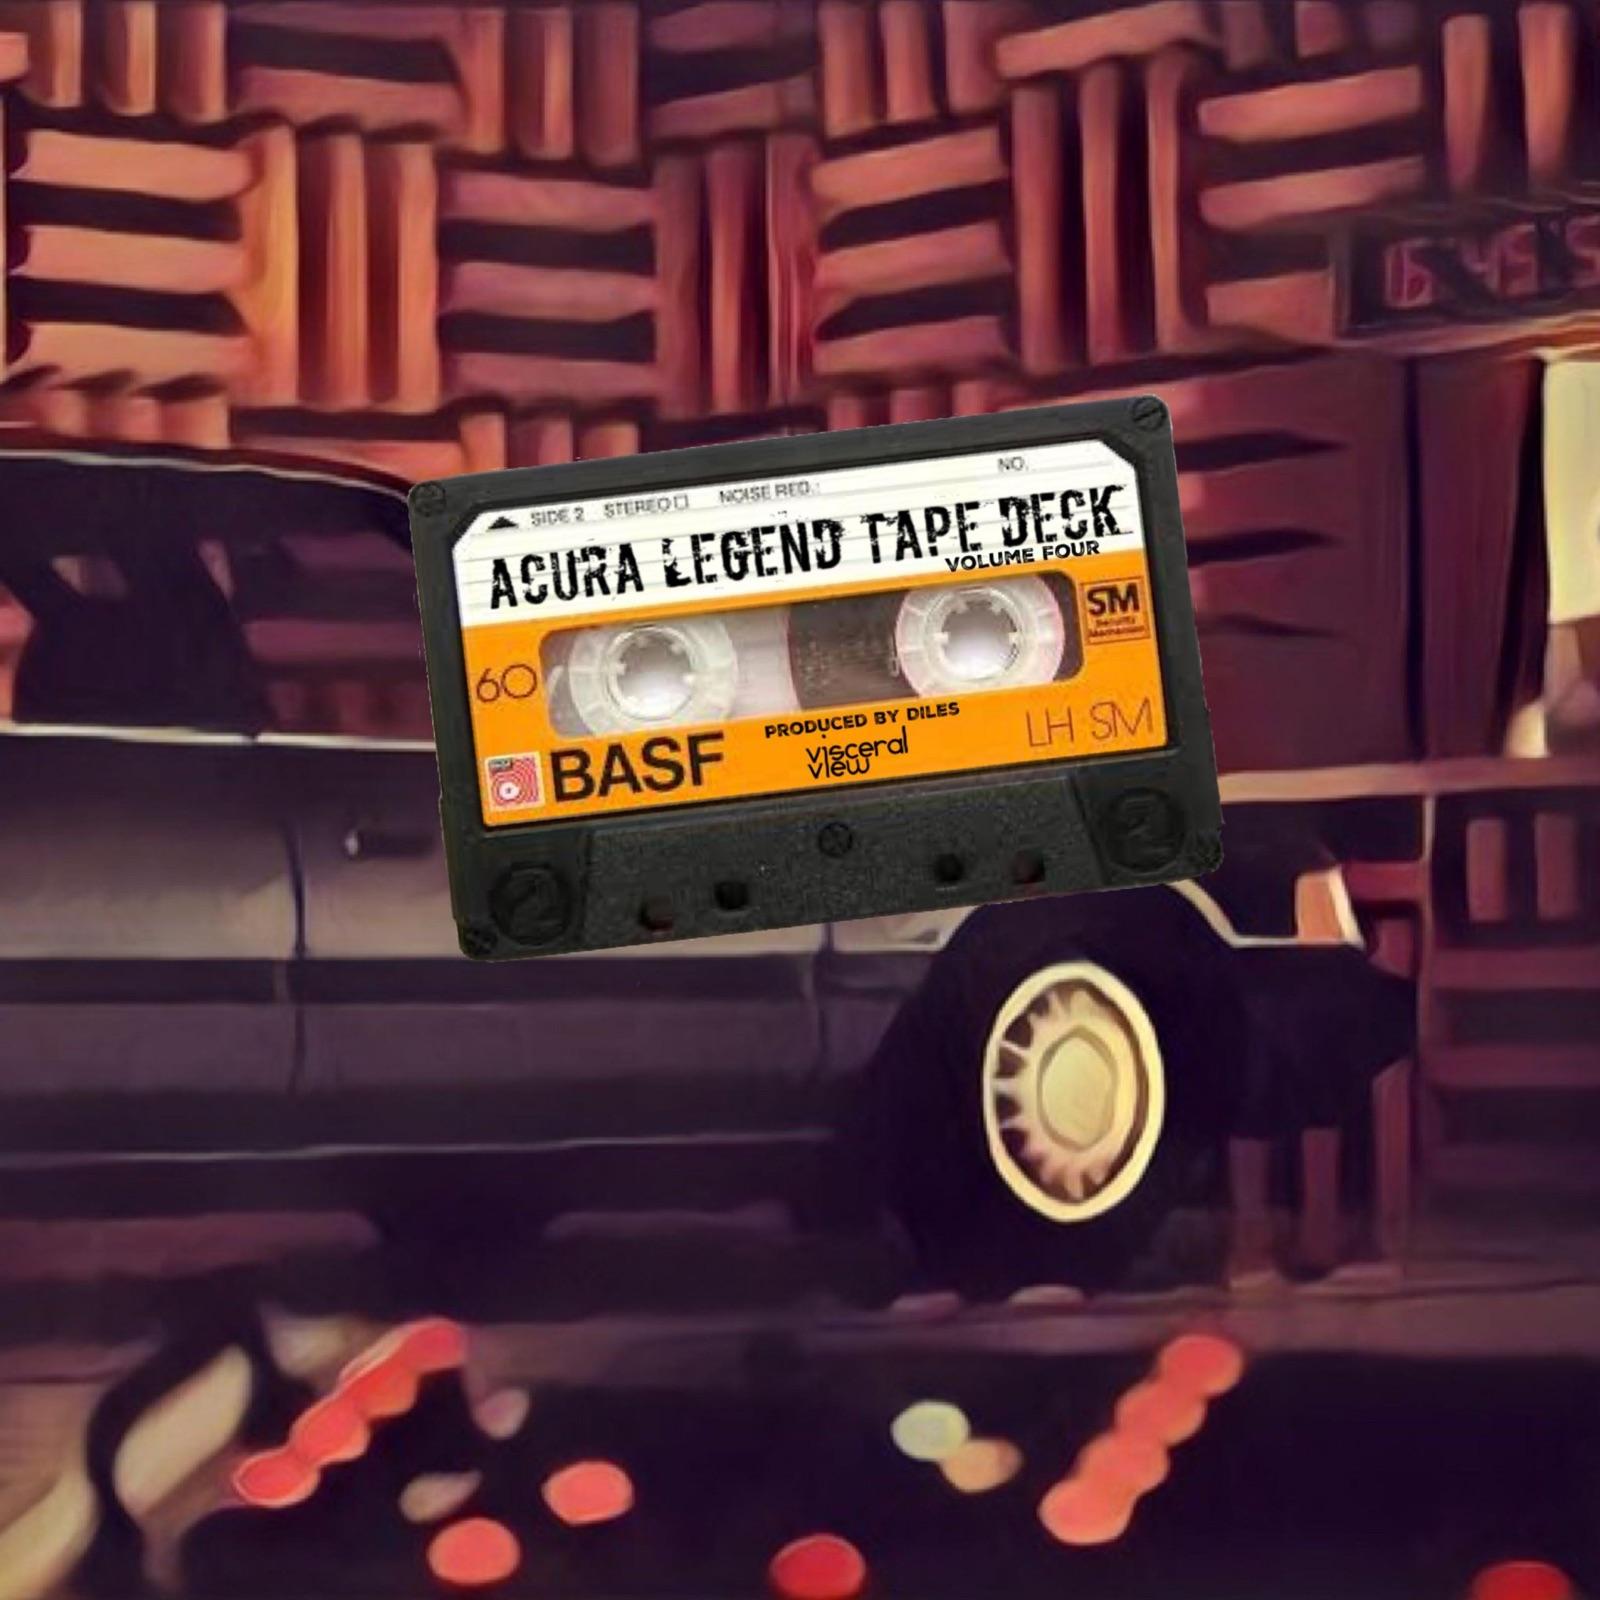 Acura Legend Tape Deck, Vol. 4